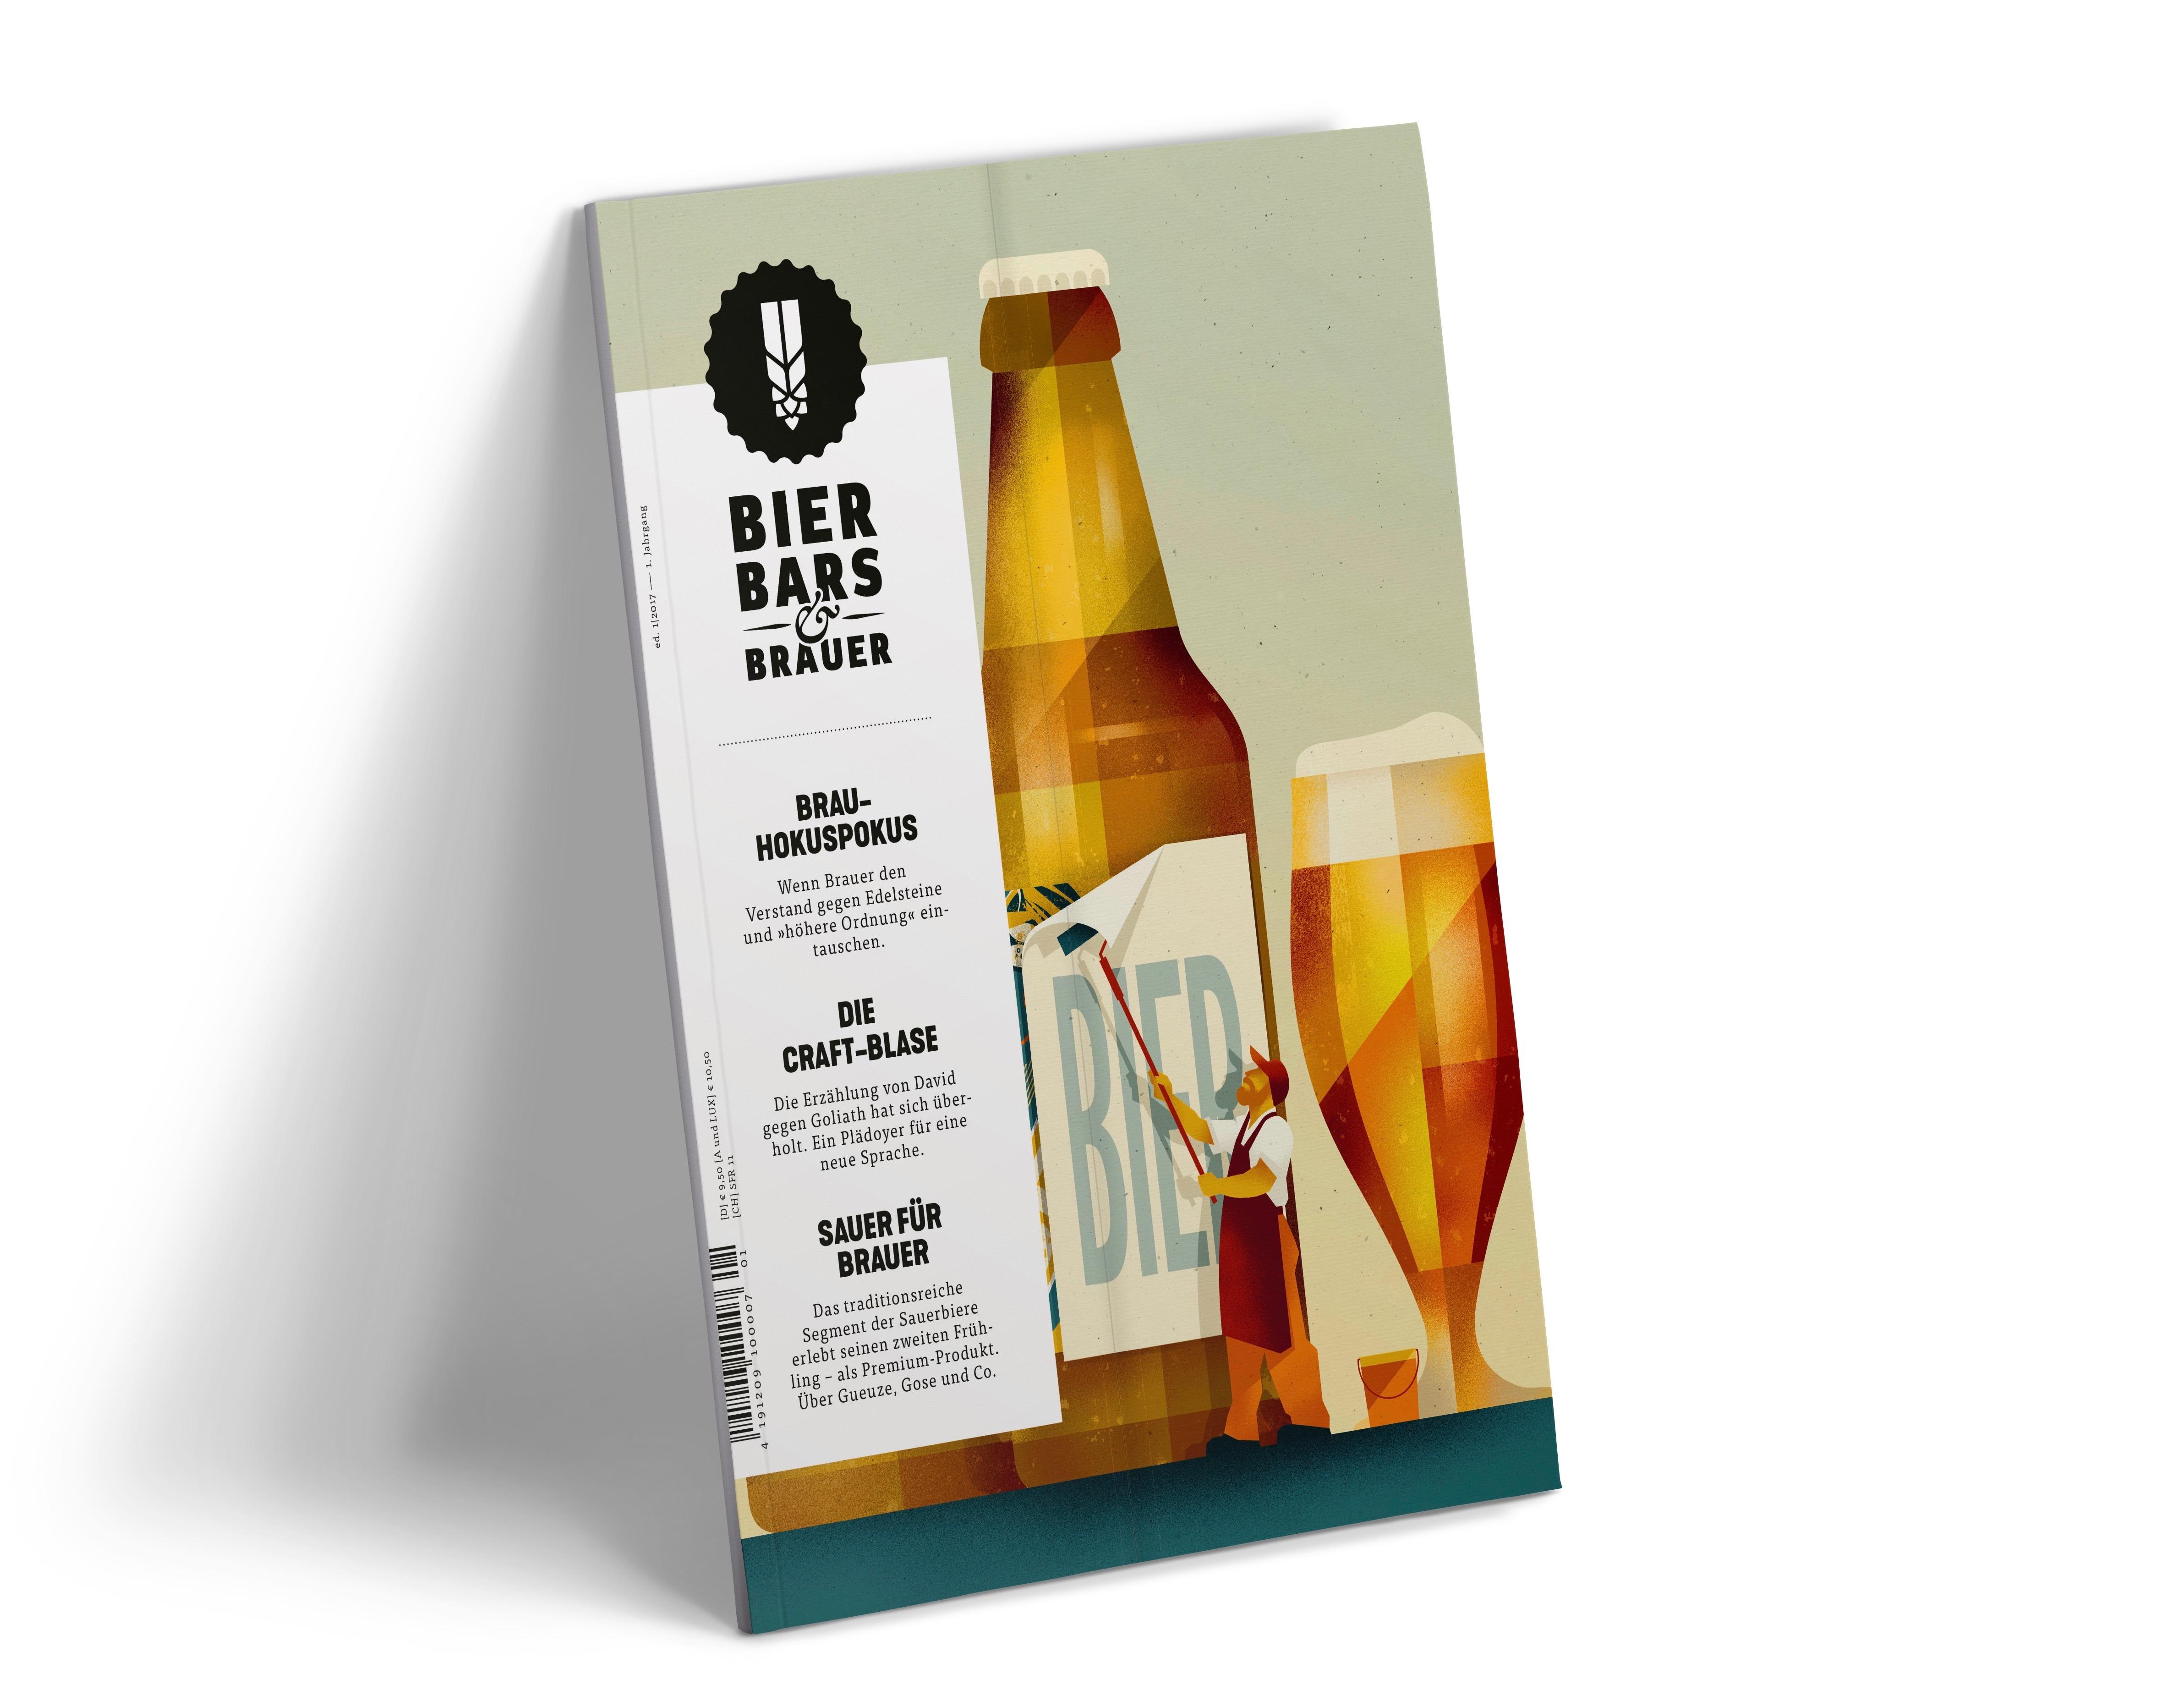 Bier, Bars & Brauer